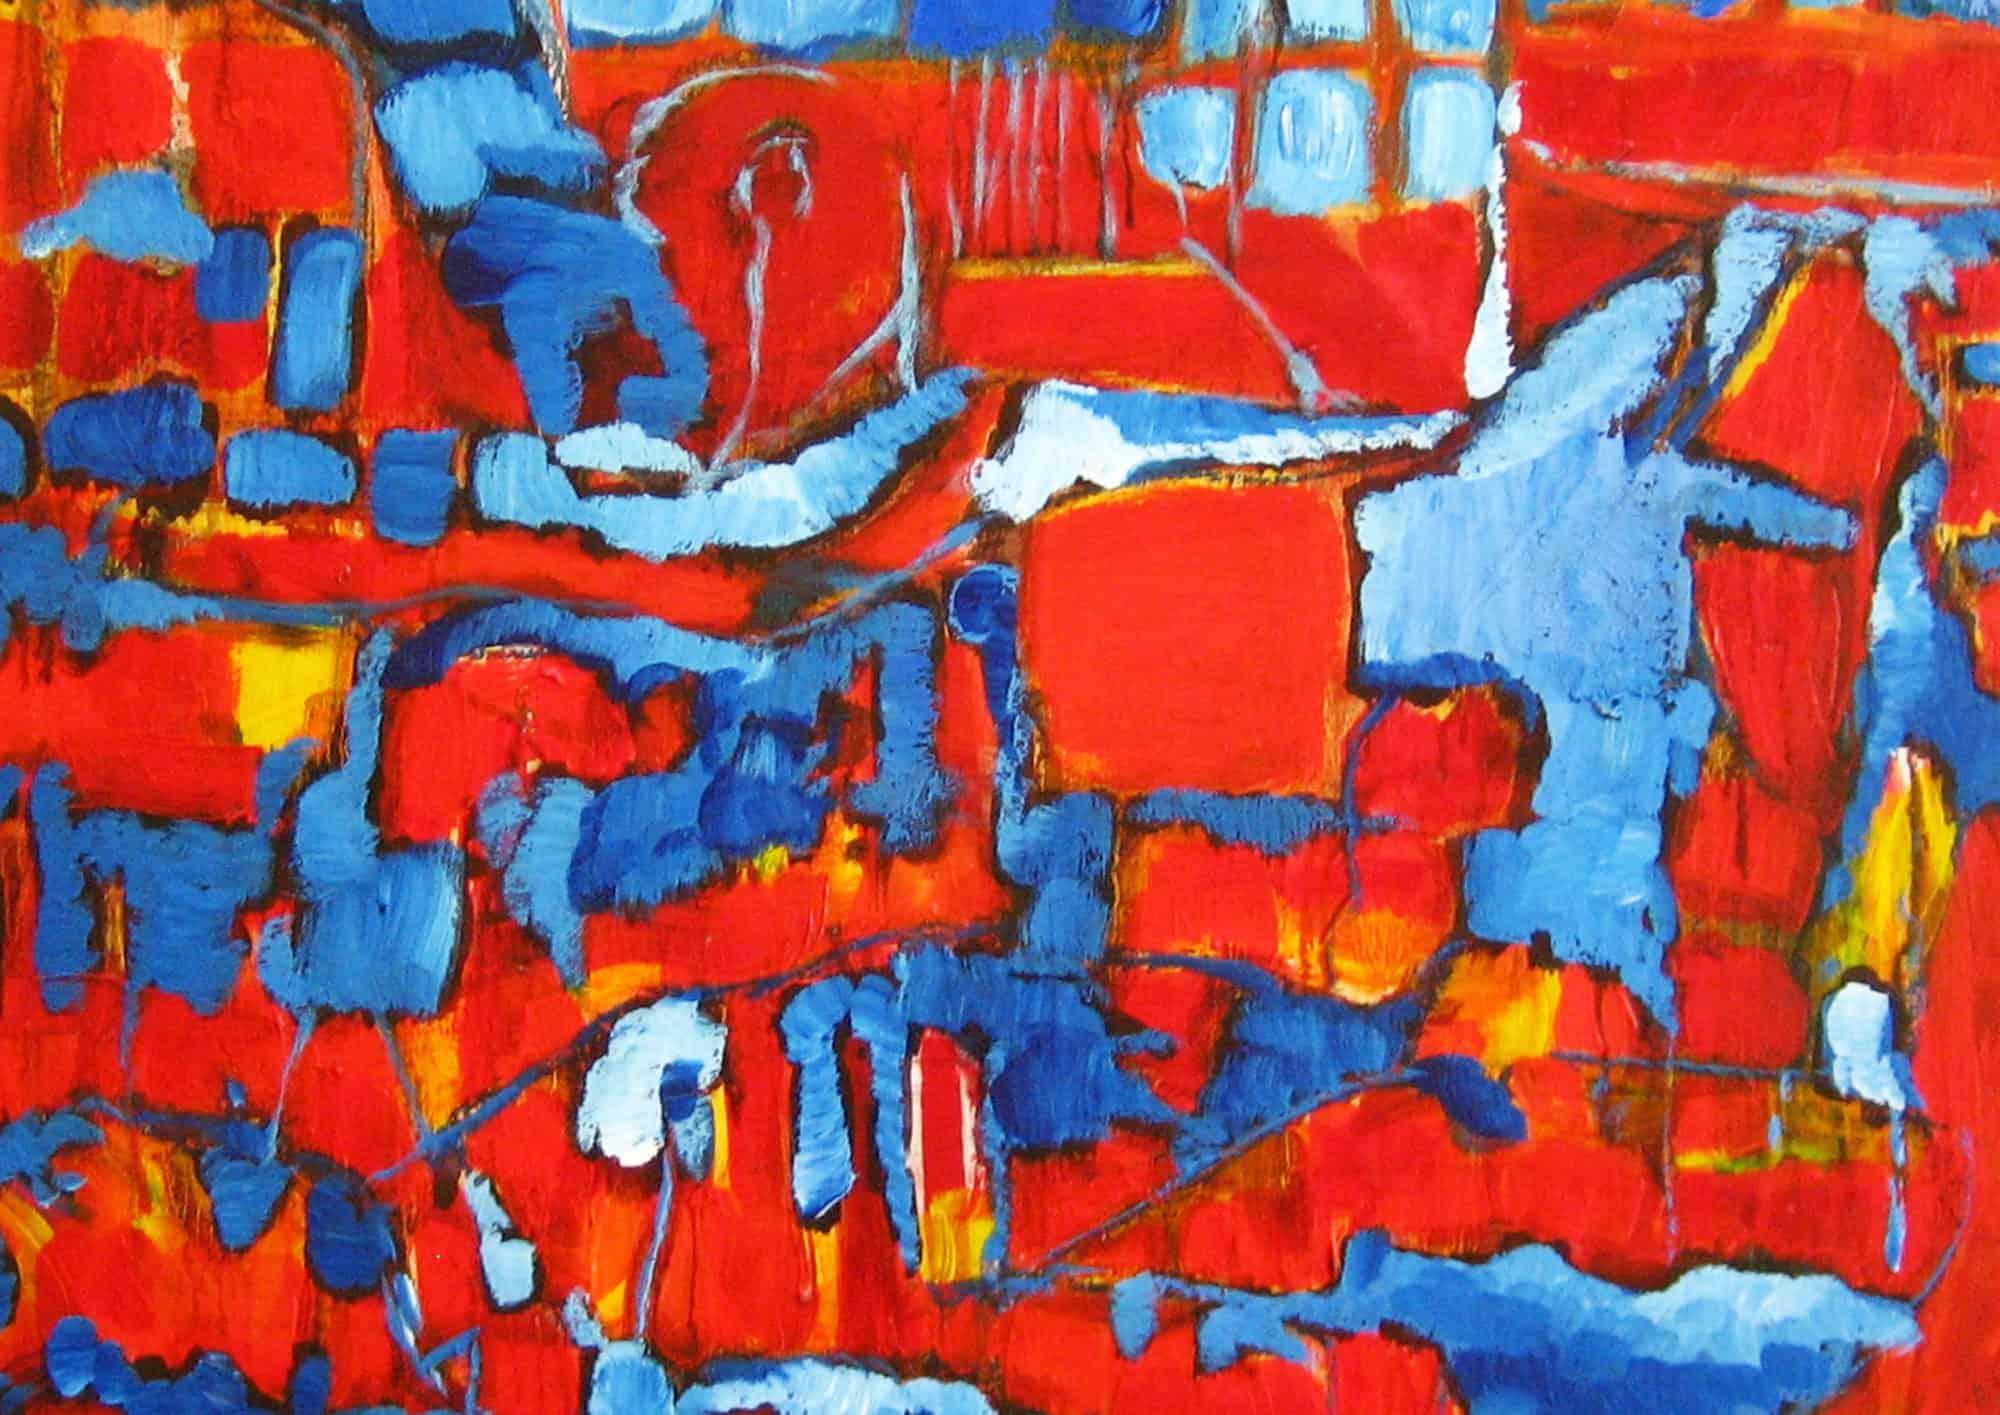 Acryl Gemälde abstrakte rote blaue Flächen